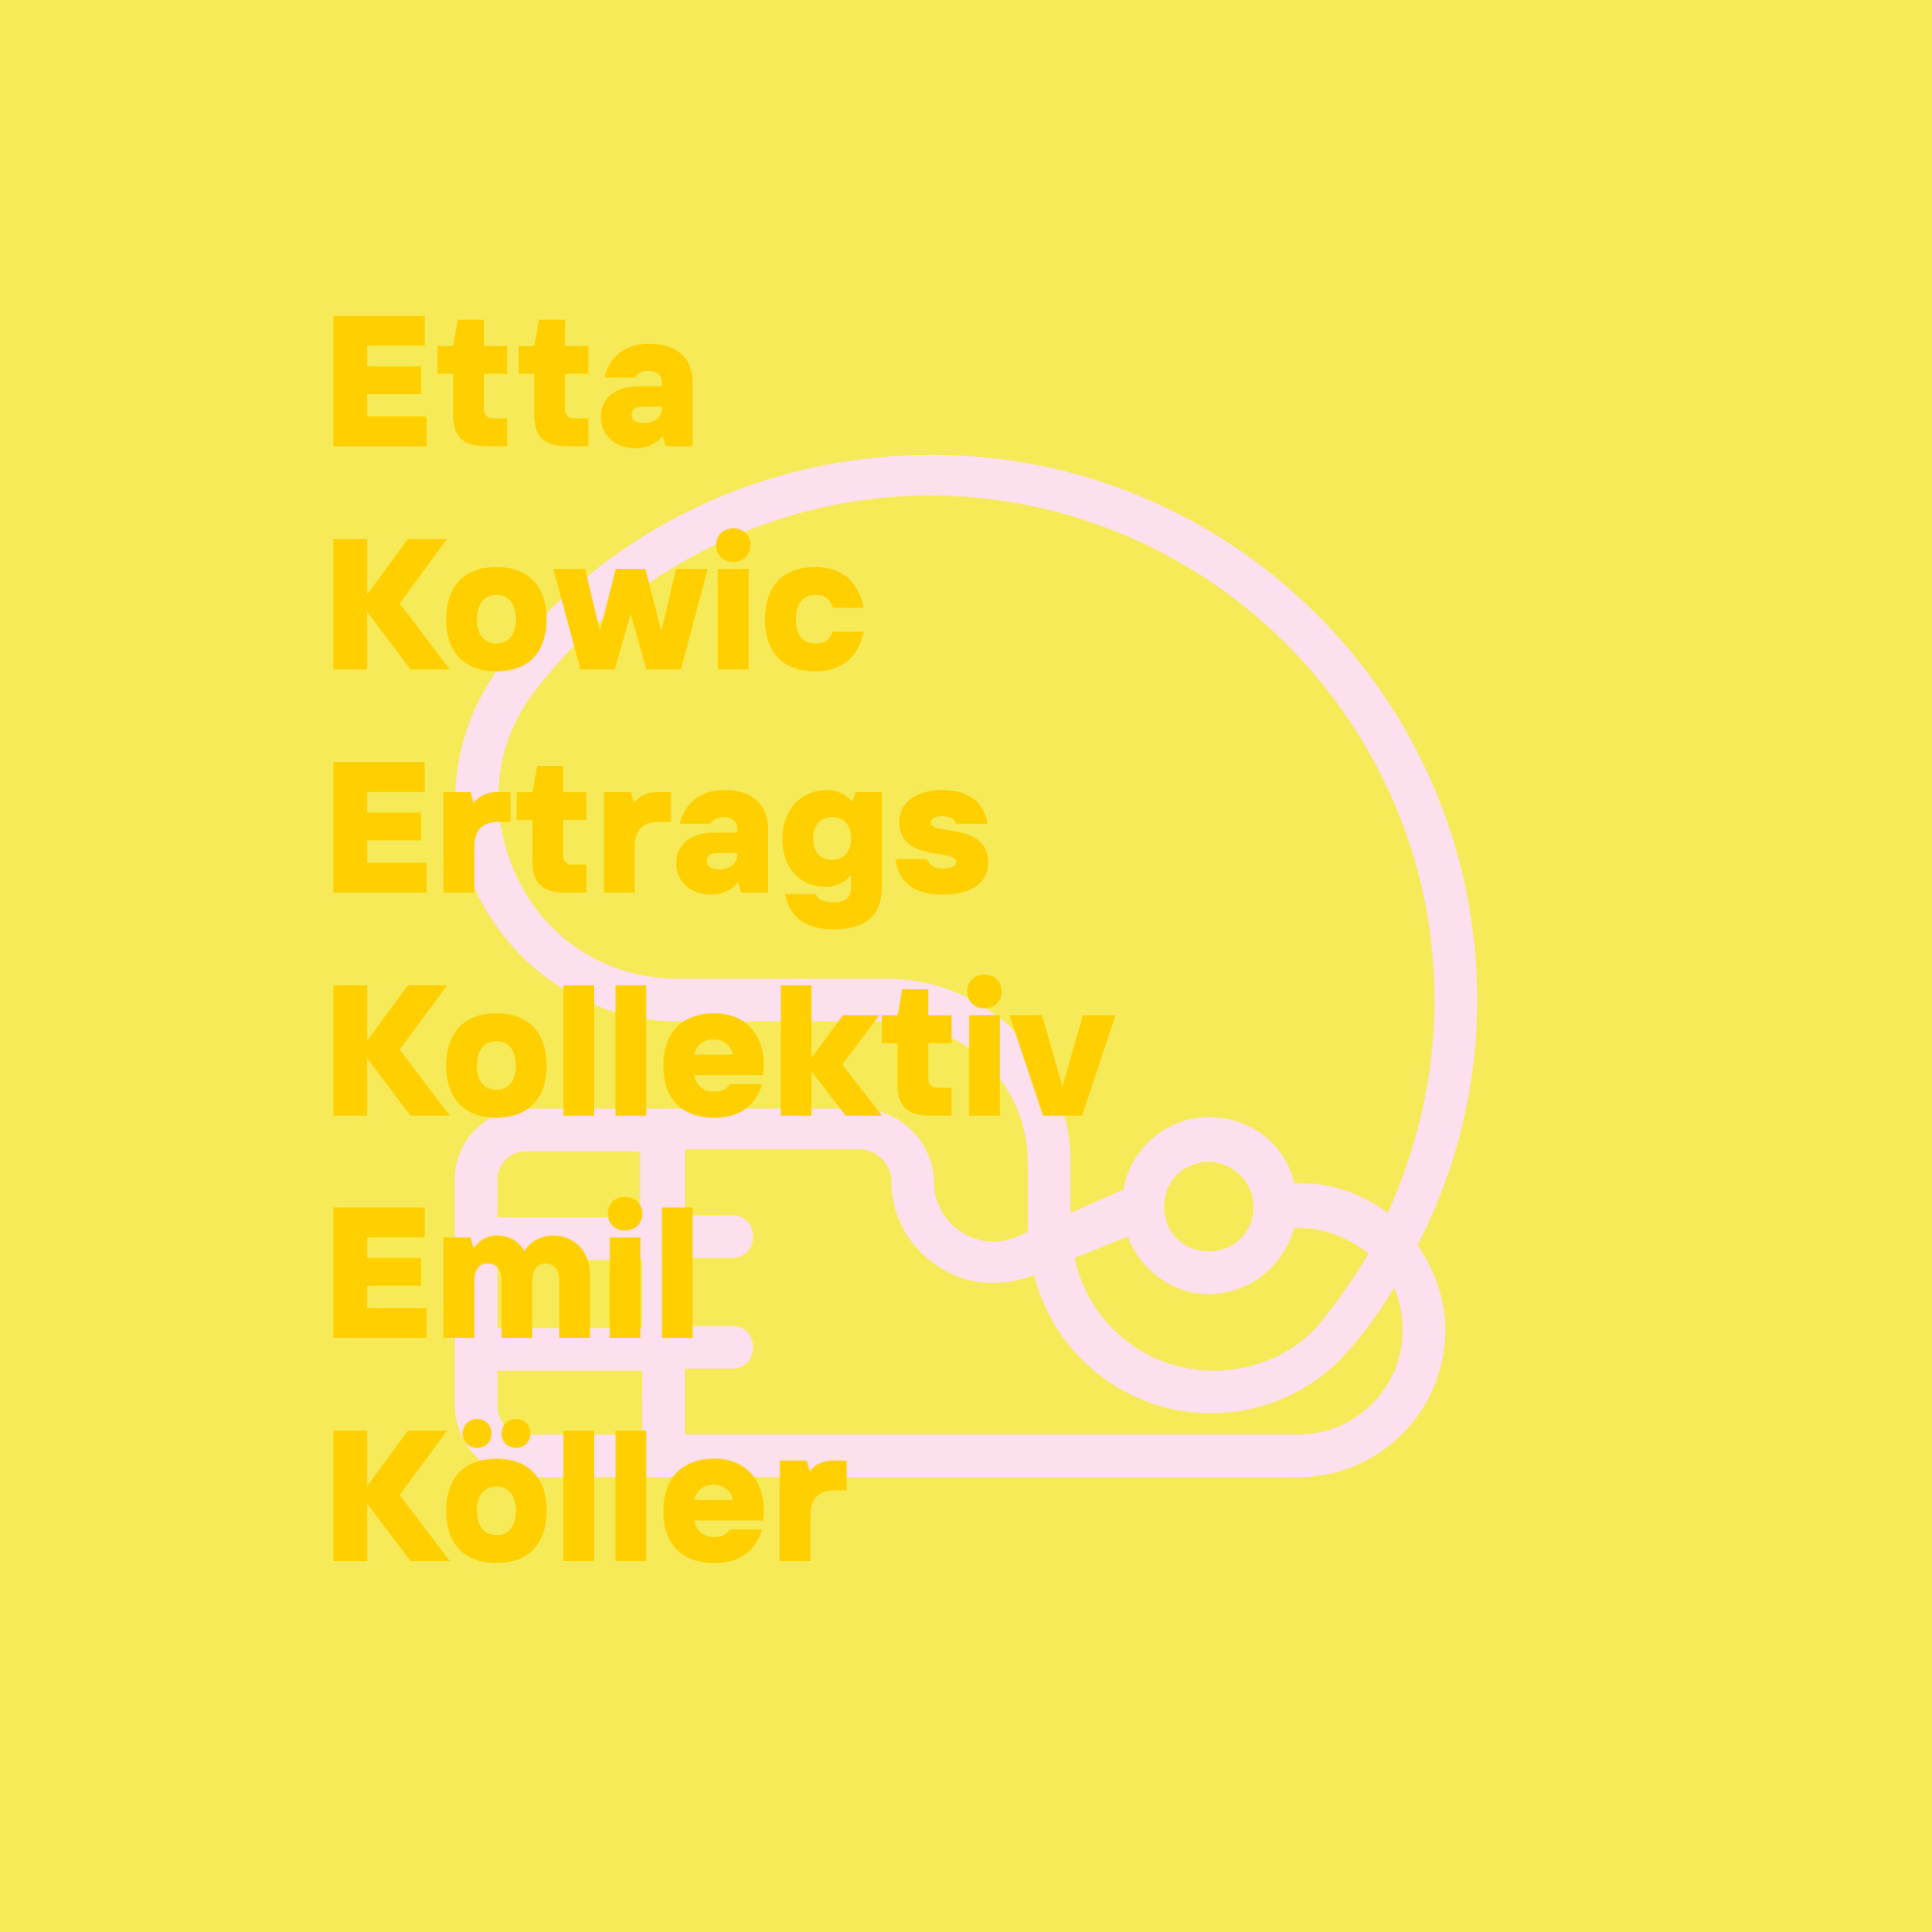 EKEKEK Visual Identity designed by Tobias Heumann